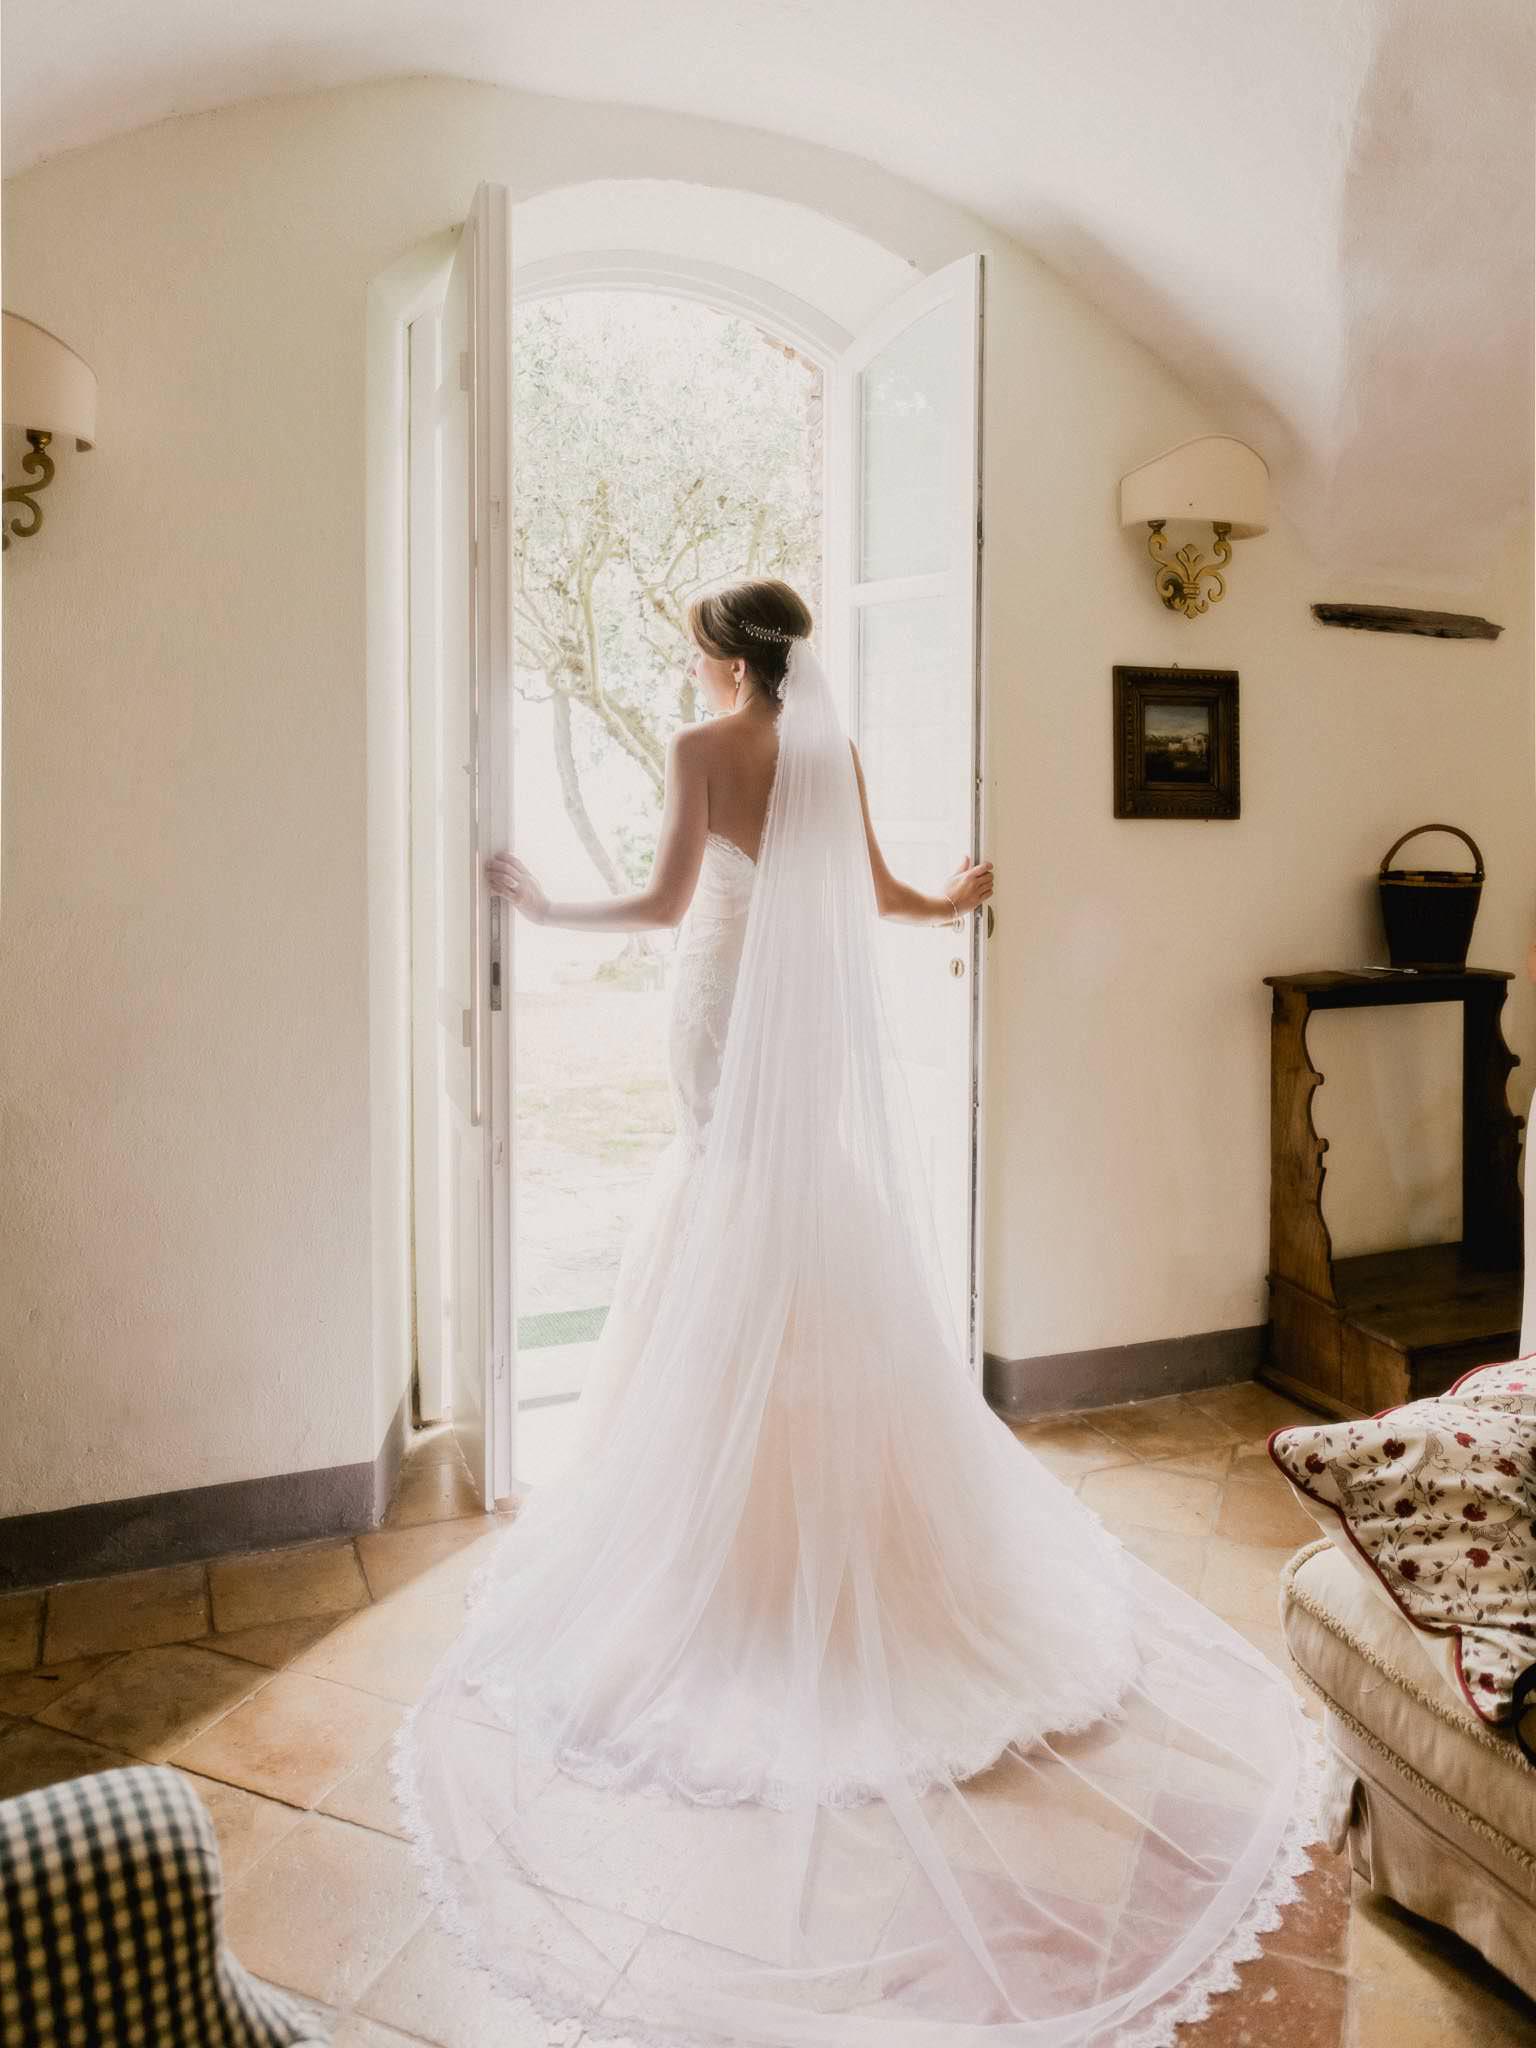 Rustic Chic Destination Wedding in Italy